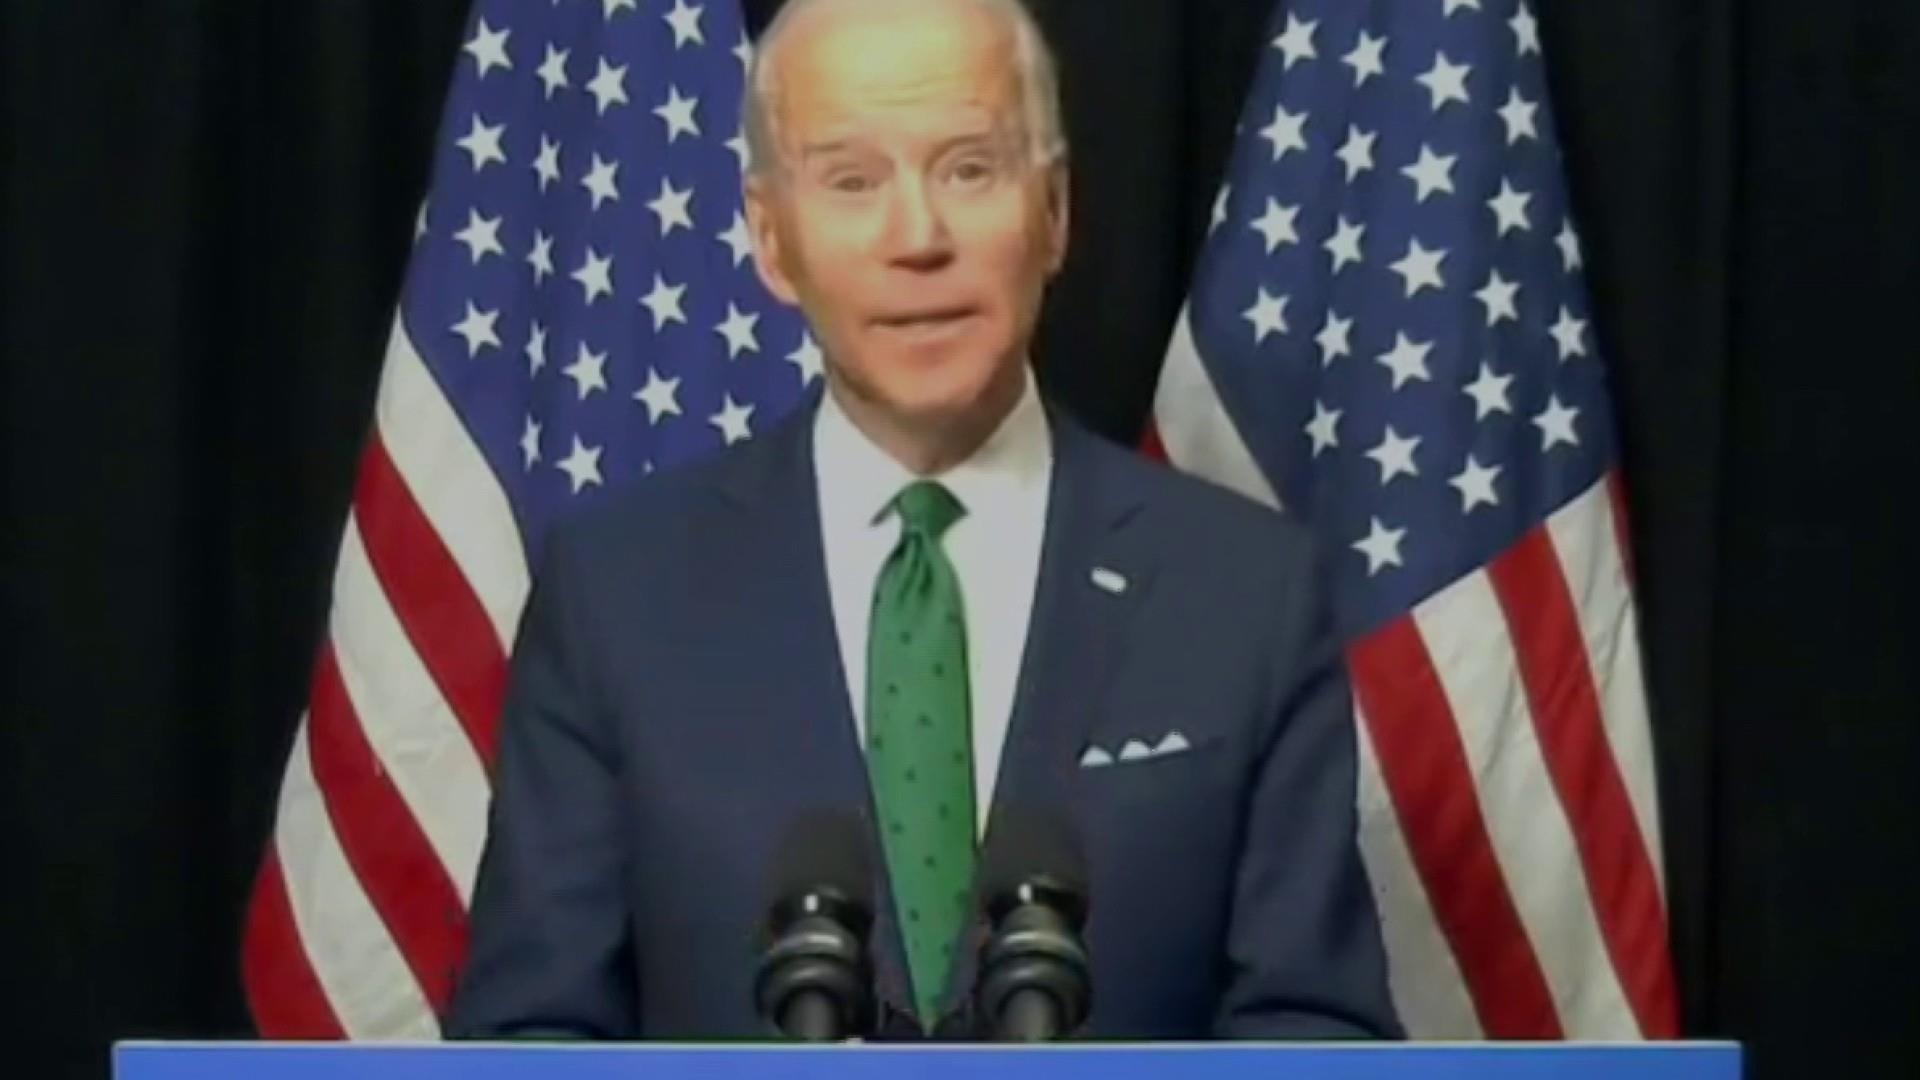 Democrats sound the alarm on Joe Biden's young voter problem